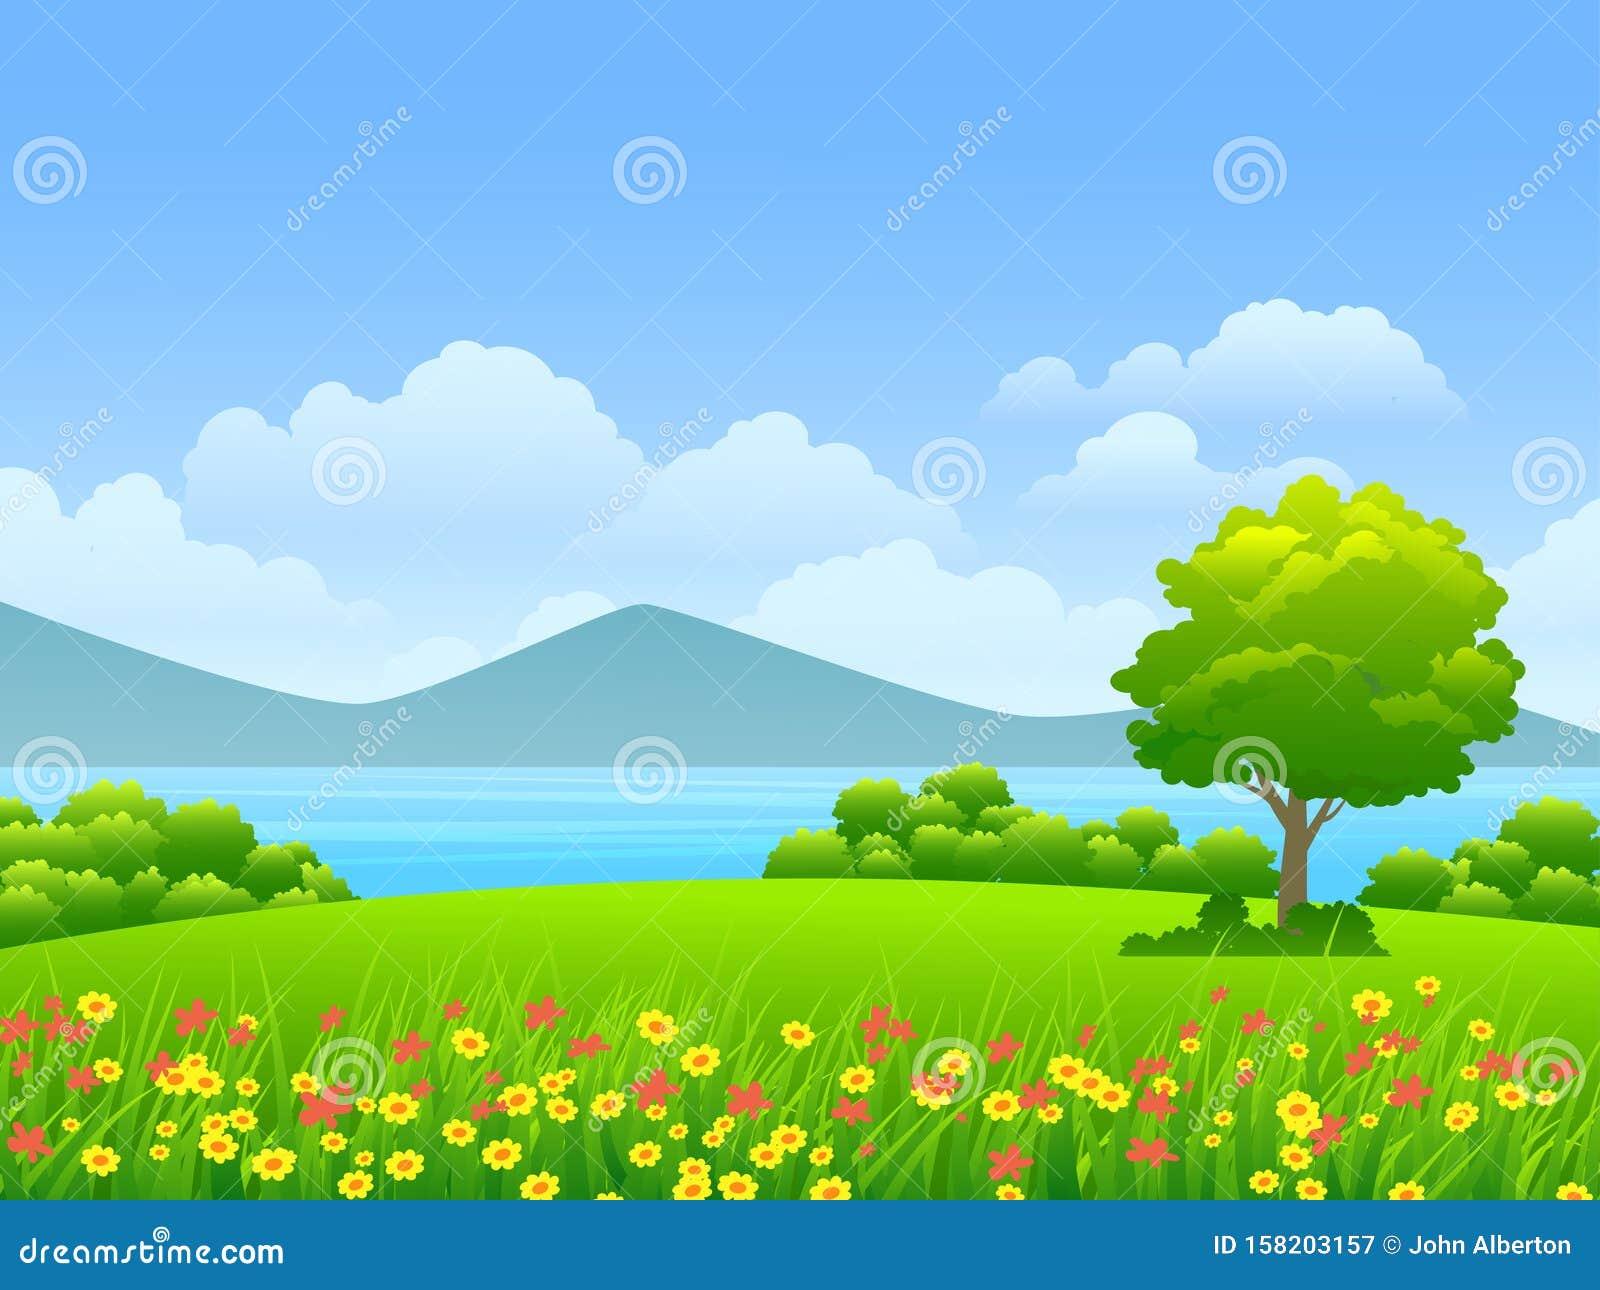 205 Cartoon Grassland Photos Free Royalty Free Stock Photos From Dreamstime